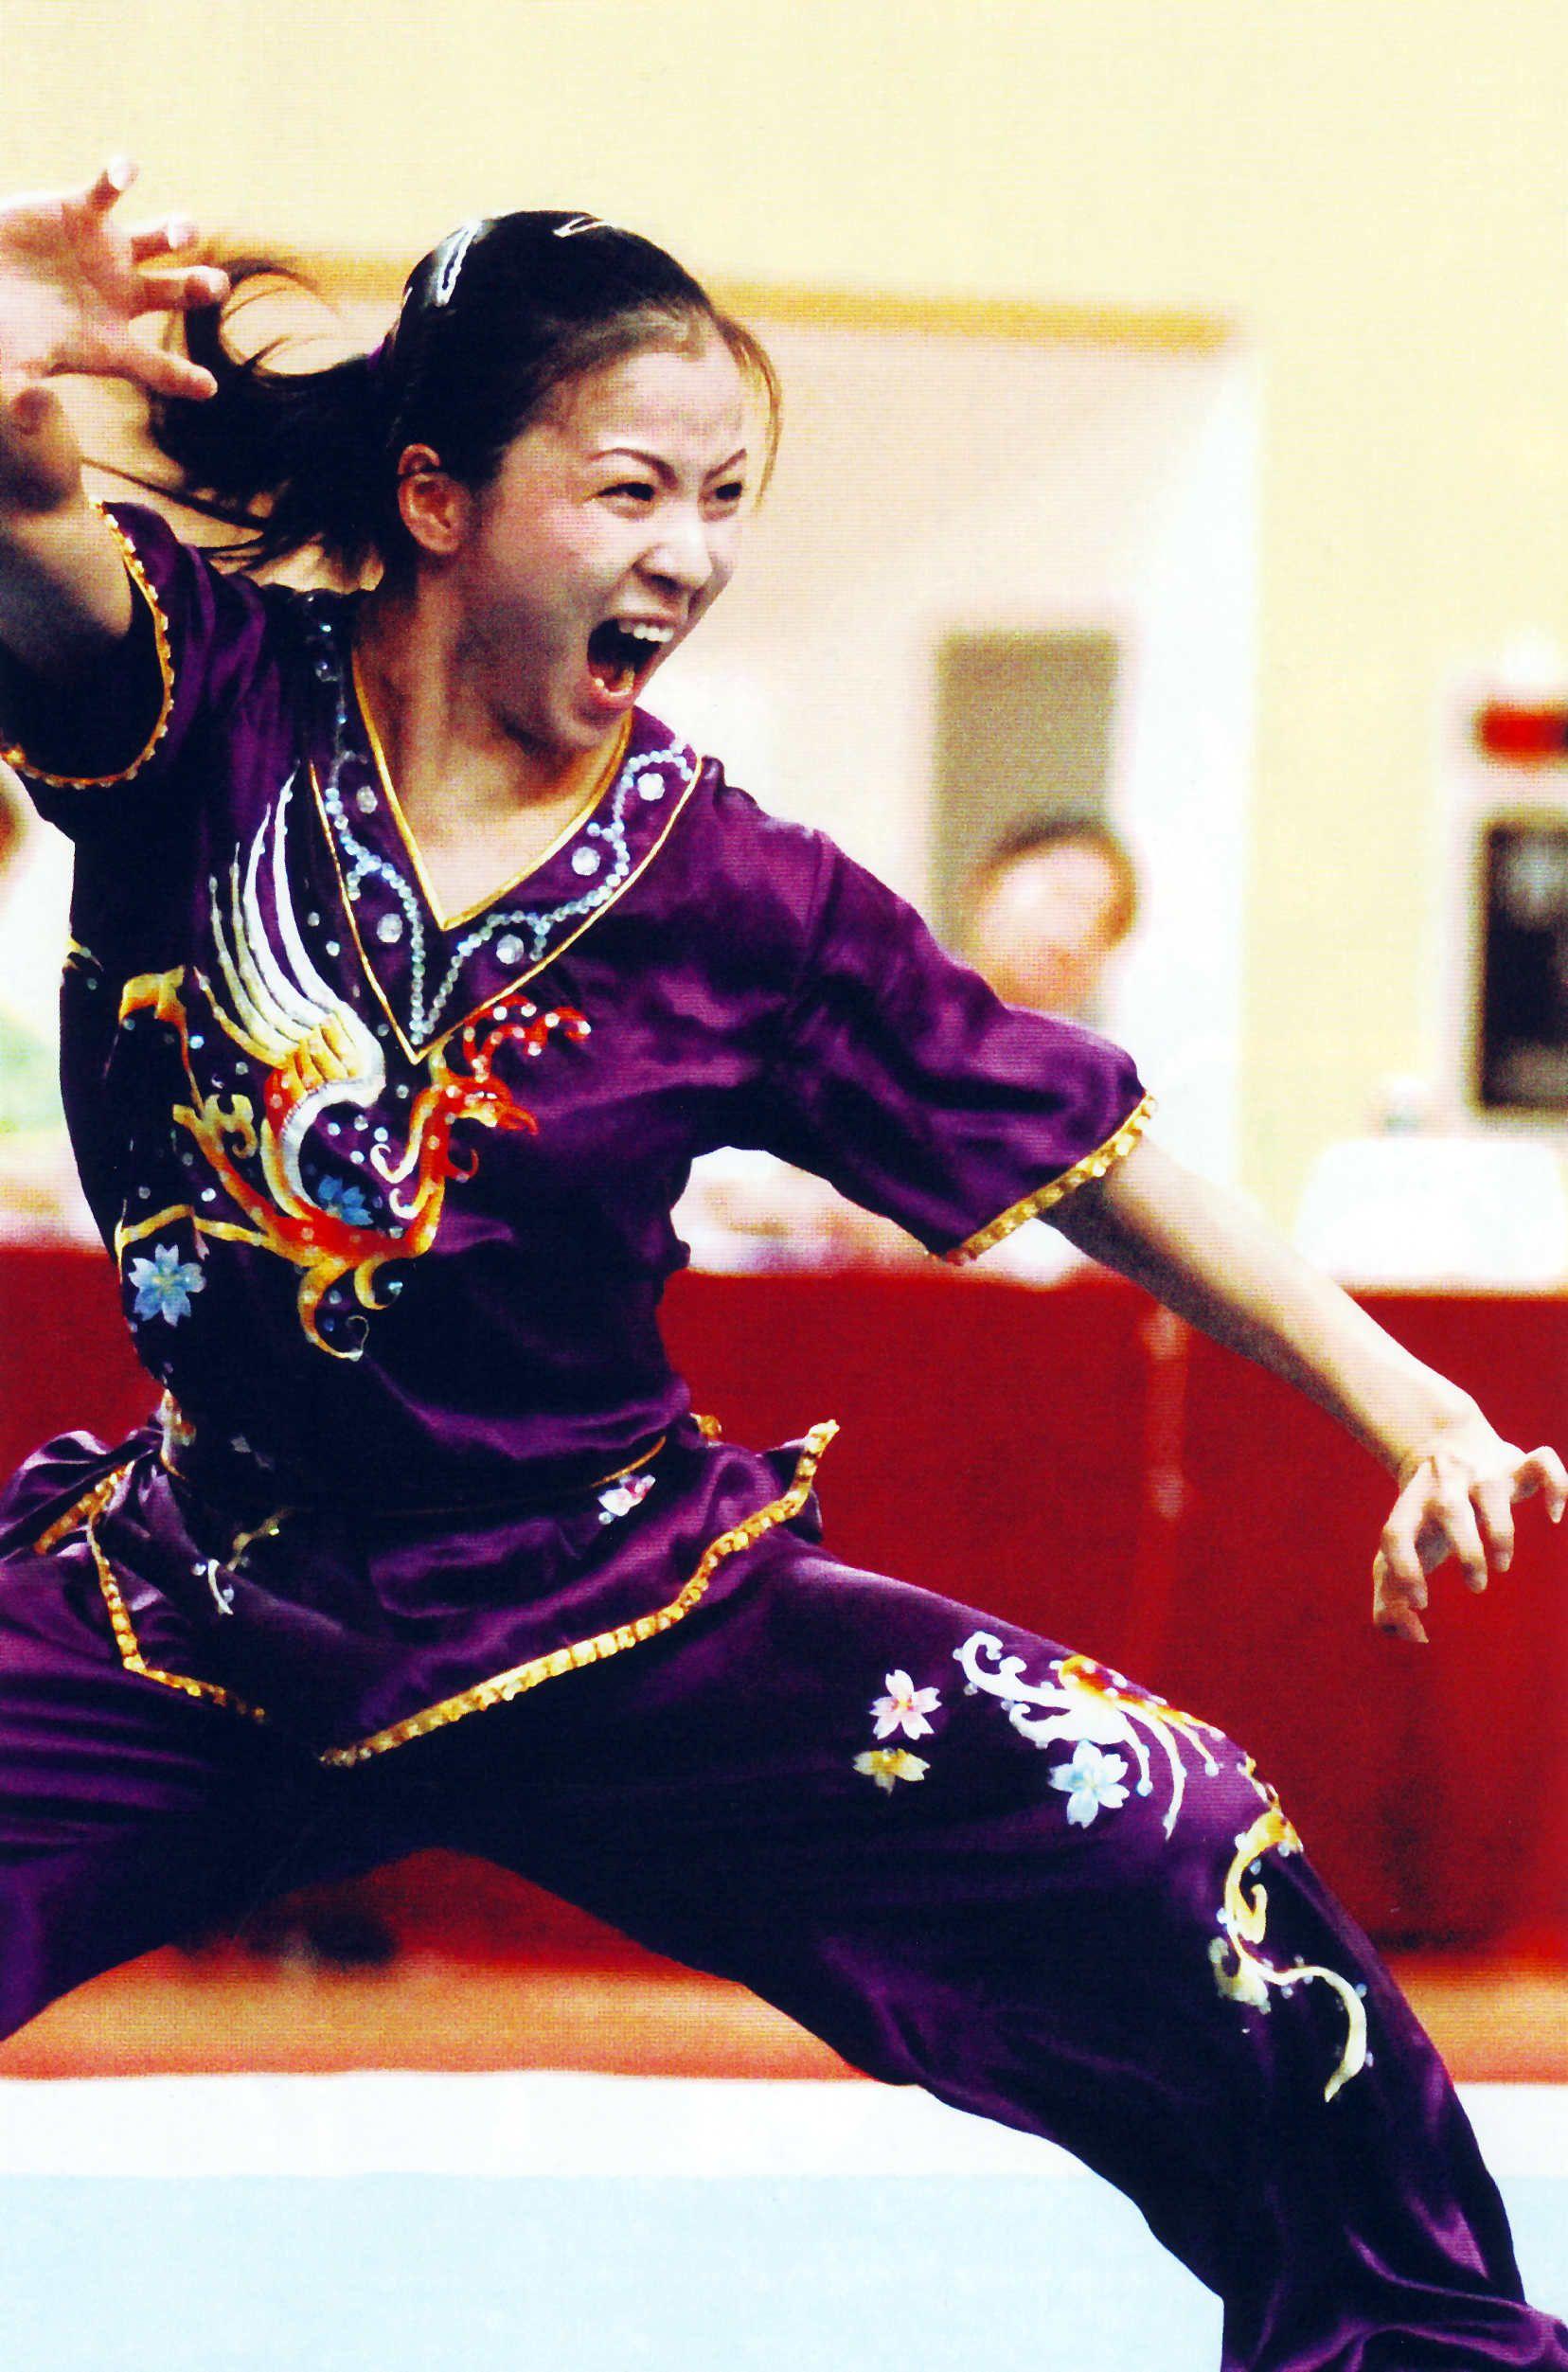 Muay Thai Girl Wallpaper Hung Gar Tiger Amp Crane And Eagle Claw Kung Fu